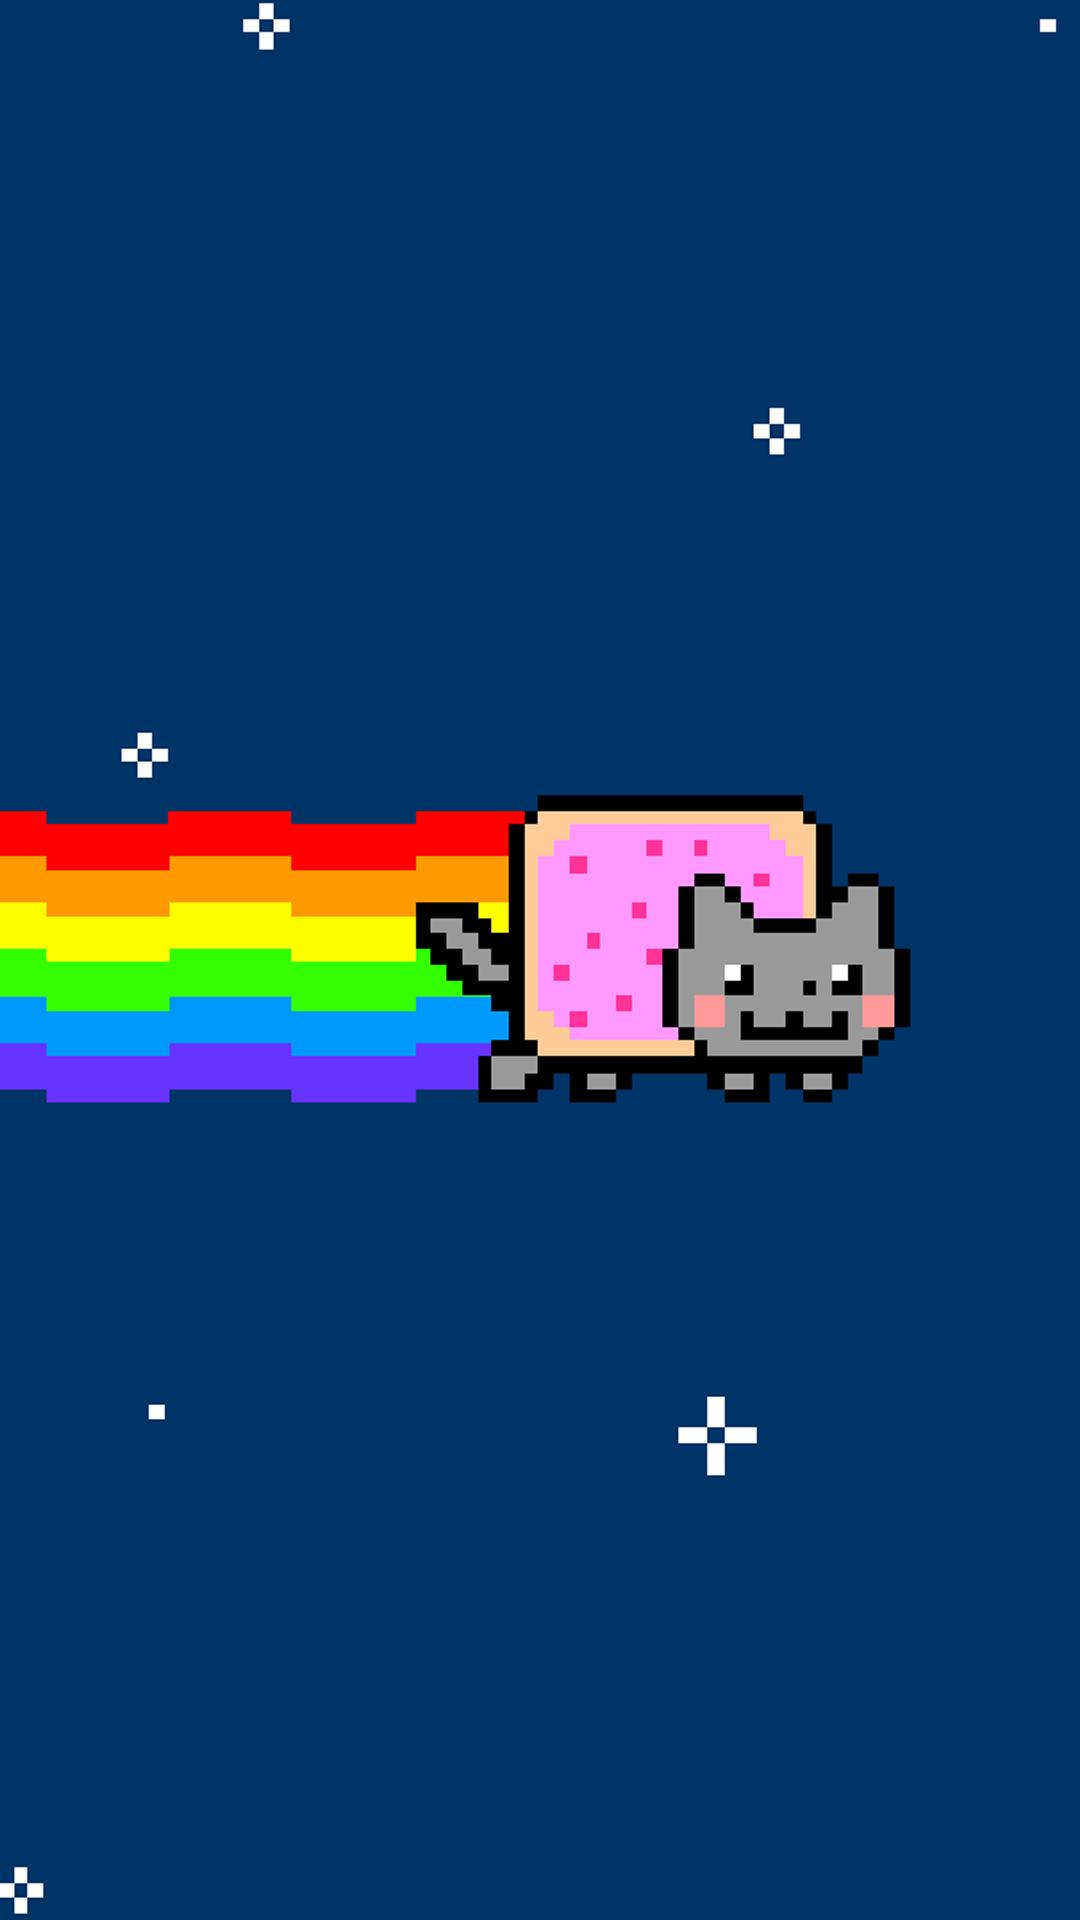 Nyan cat htc one wallpaper